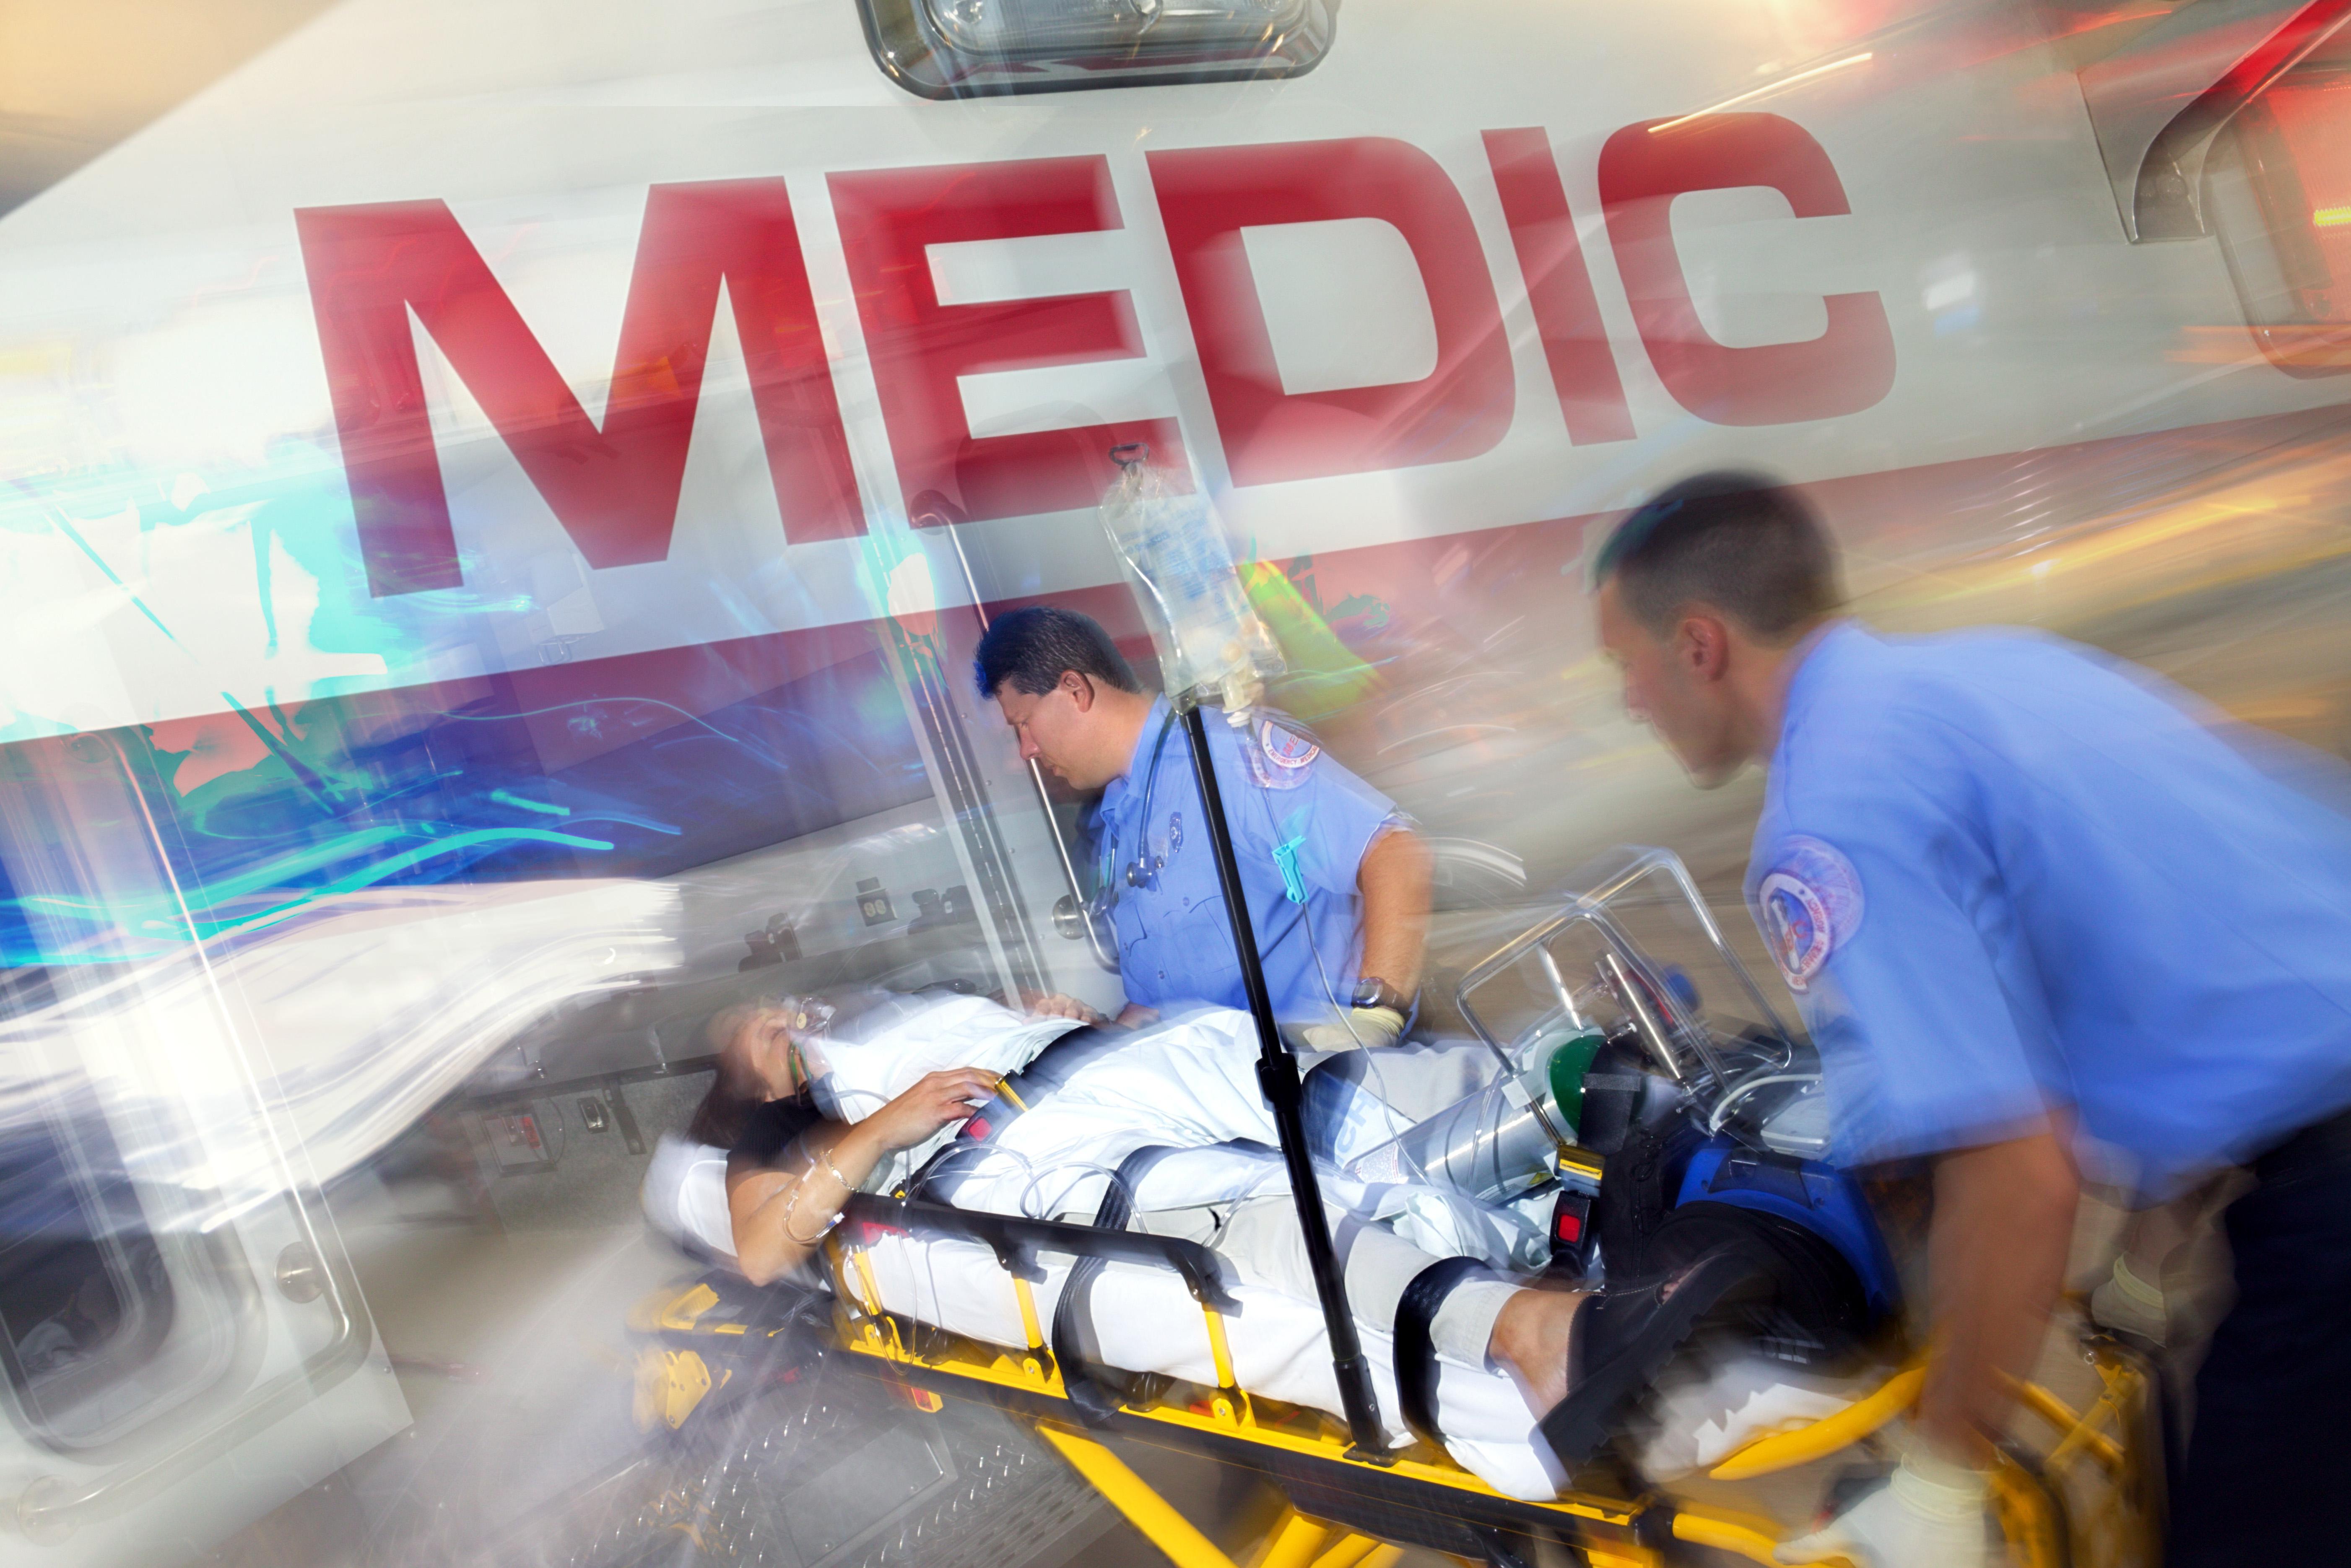 Paramedics loading patient into ambulance